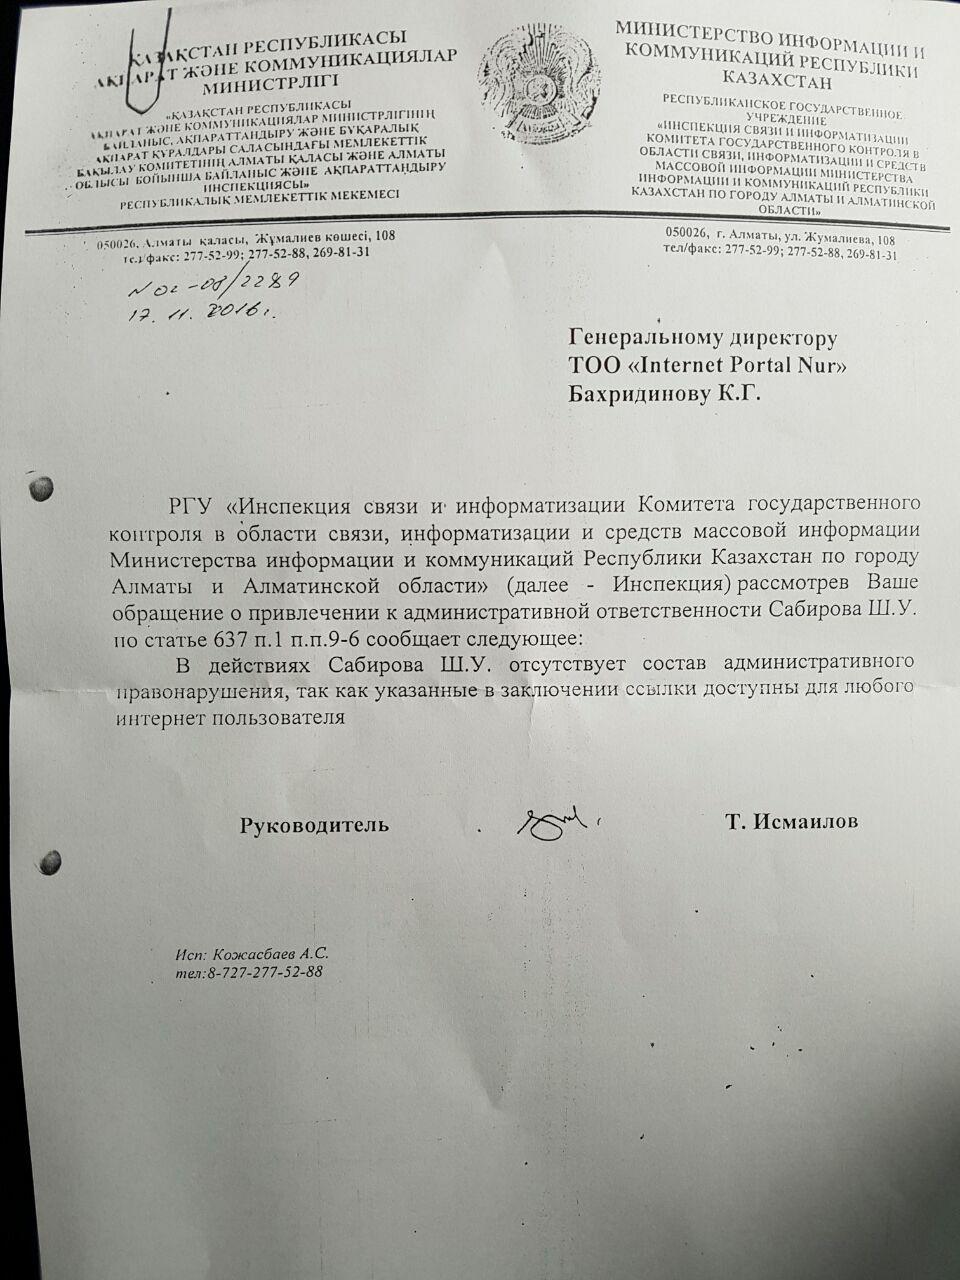 Инспекция связи не нашла нарушений в действиях Шавката Сабирова